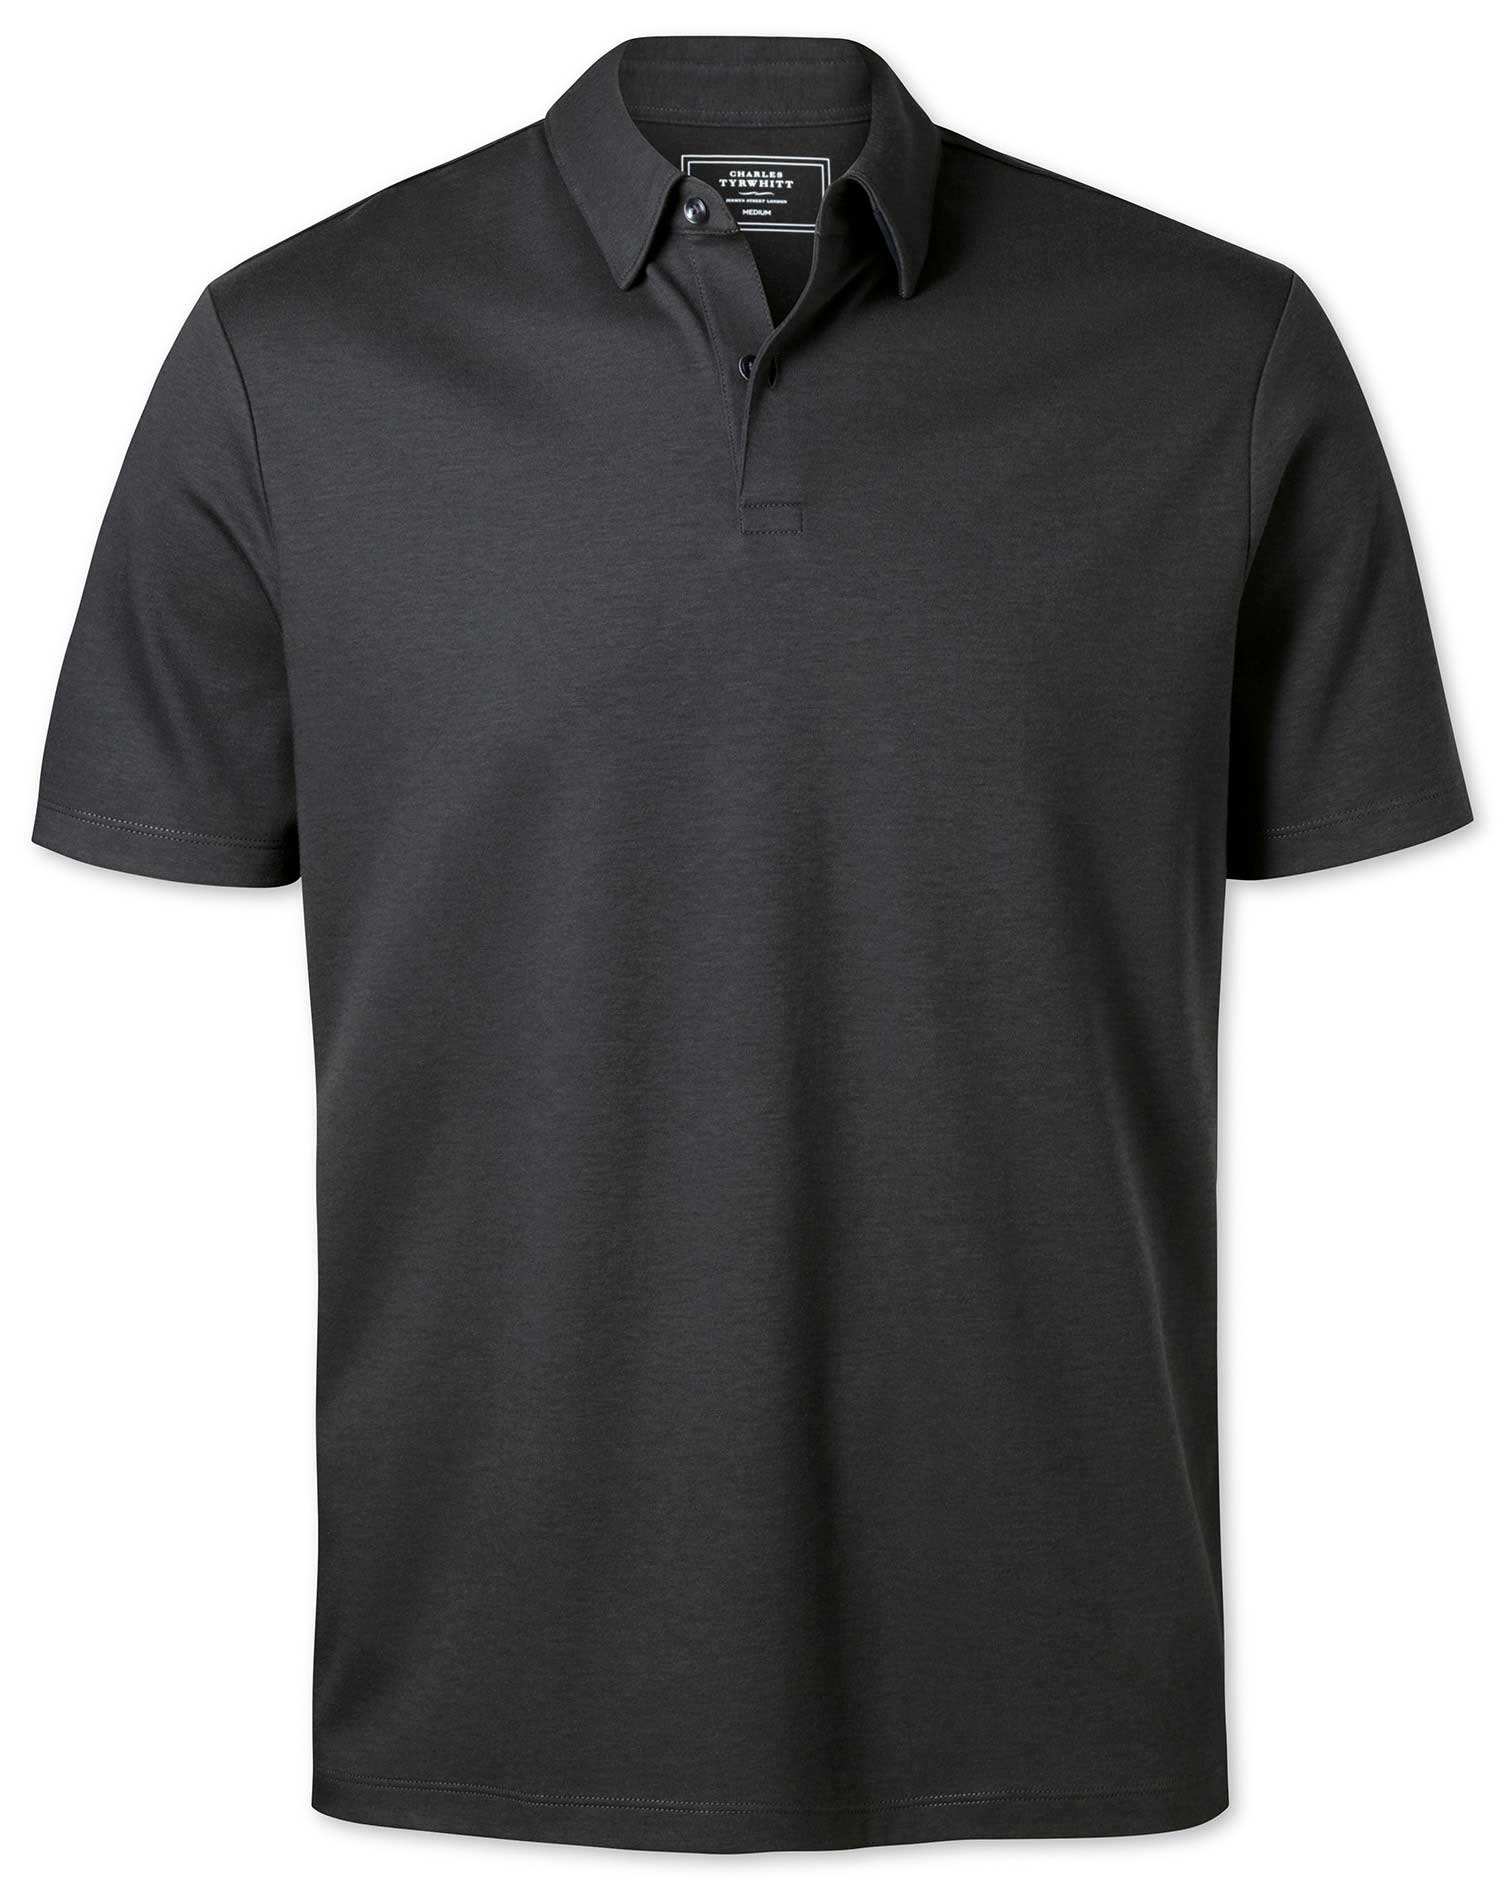 Plain Charcoal Jersey Cotton Polo Size Medium by Charles Tyrwhitt